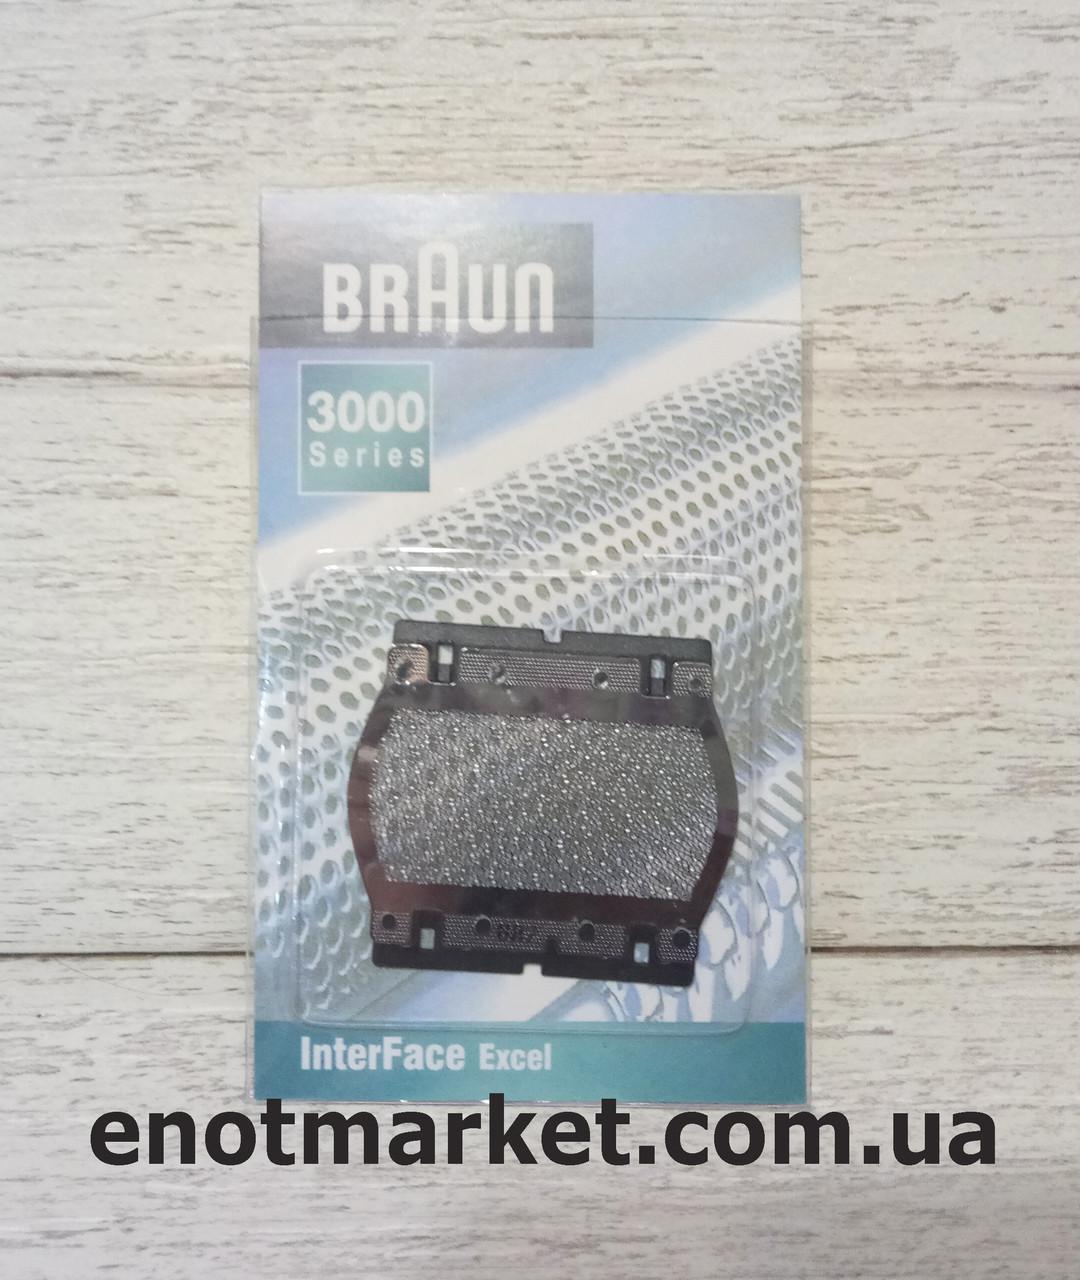 Сетка аналог для электробритвы Braun 3000 682